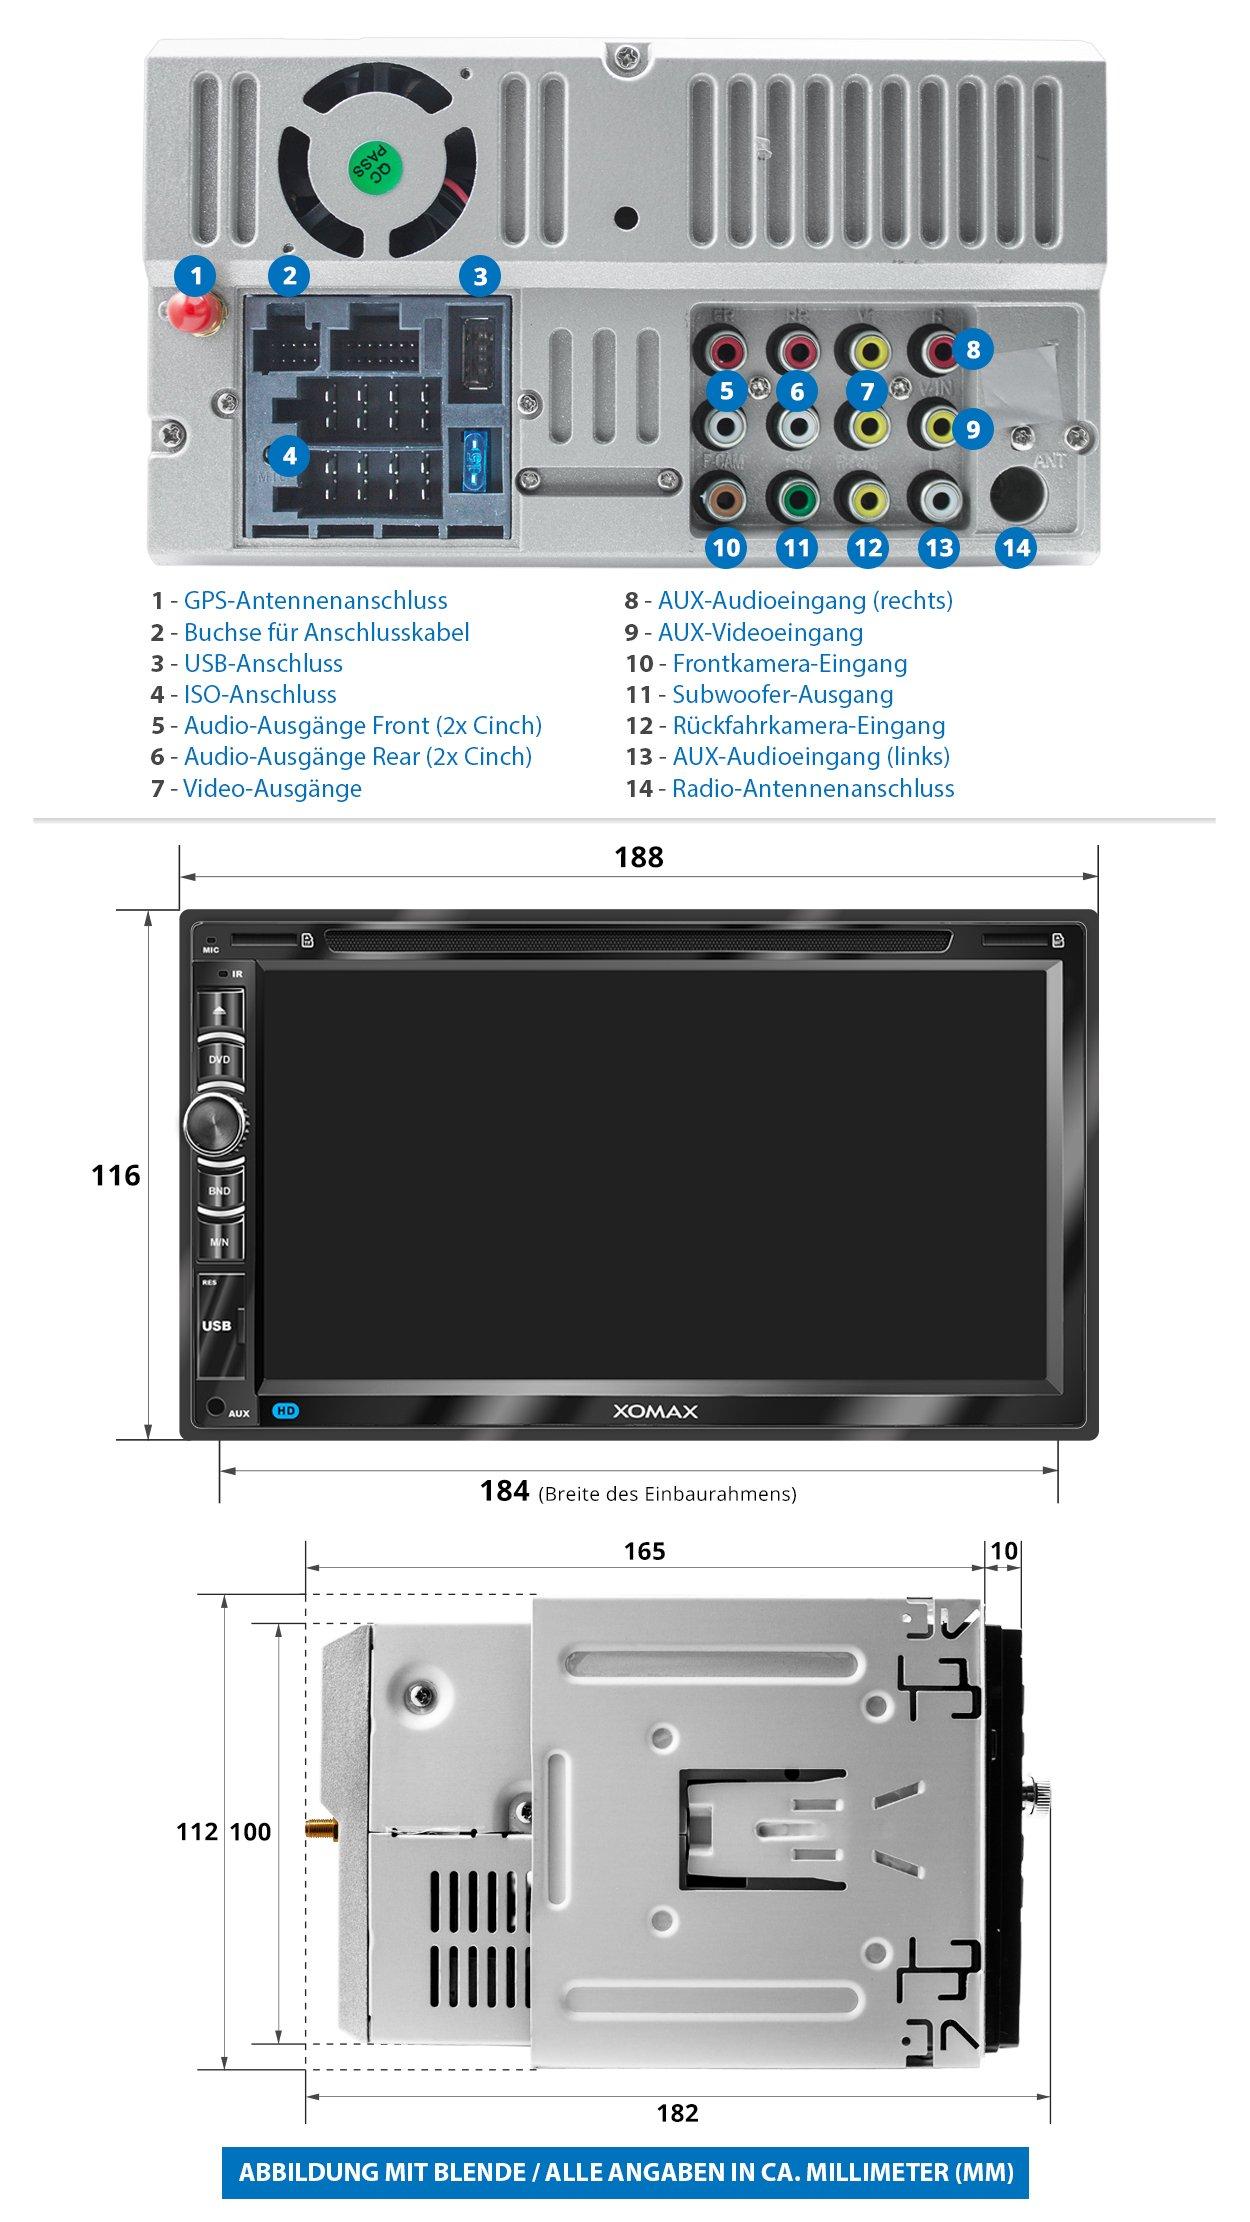 XOMAX-XM-2DN6906-Autoradio-mit-Mirrorlink-I-GPS-Navigation-I-Navi-Software-inkl-Europa-Karten-I-Bluetooth-Freisprecheinrichtung-I-18cm-Touchscreen-Bildschirm-I-DVD-CD-Player-I-SD-I-USB-I-Aux-I-2-DIN